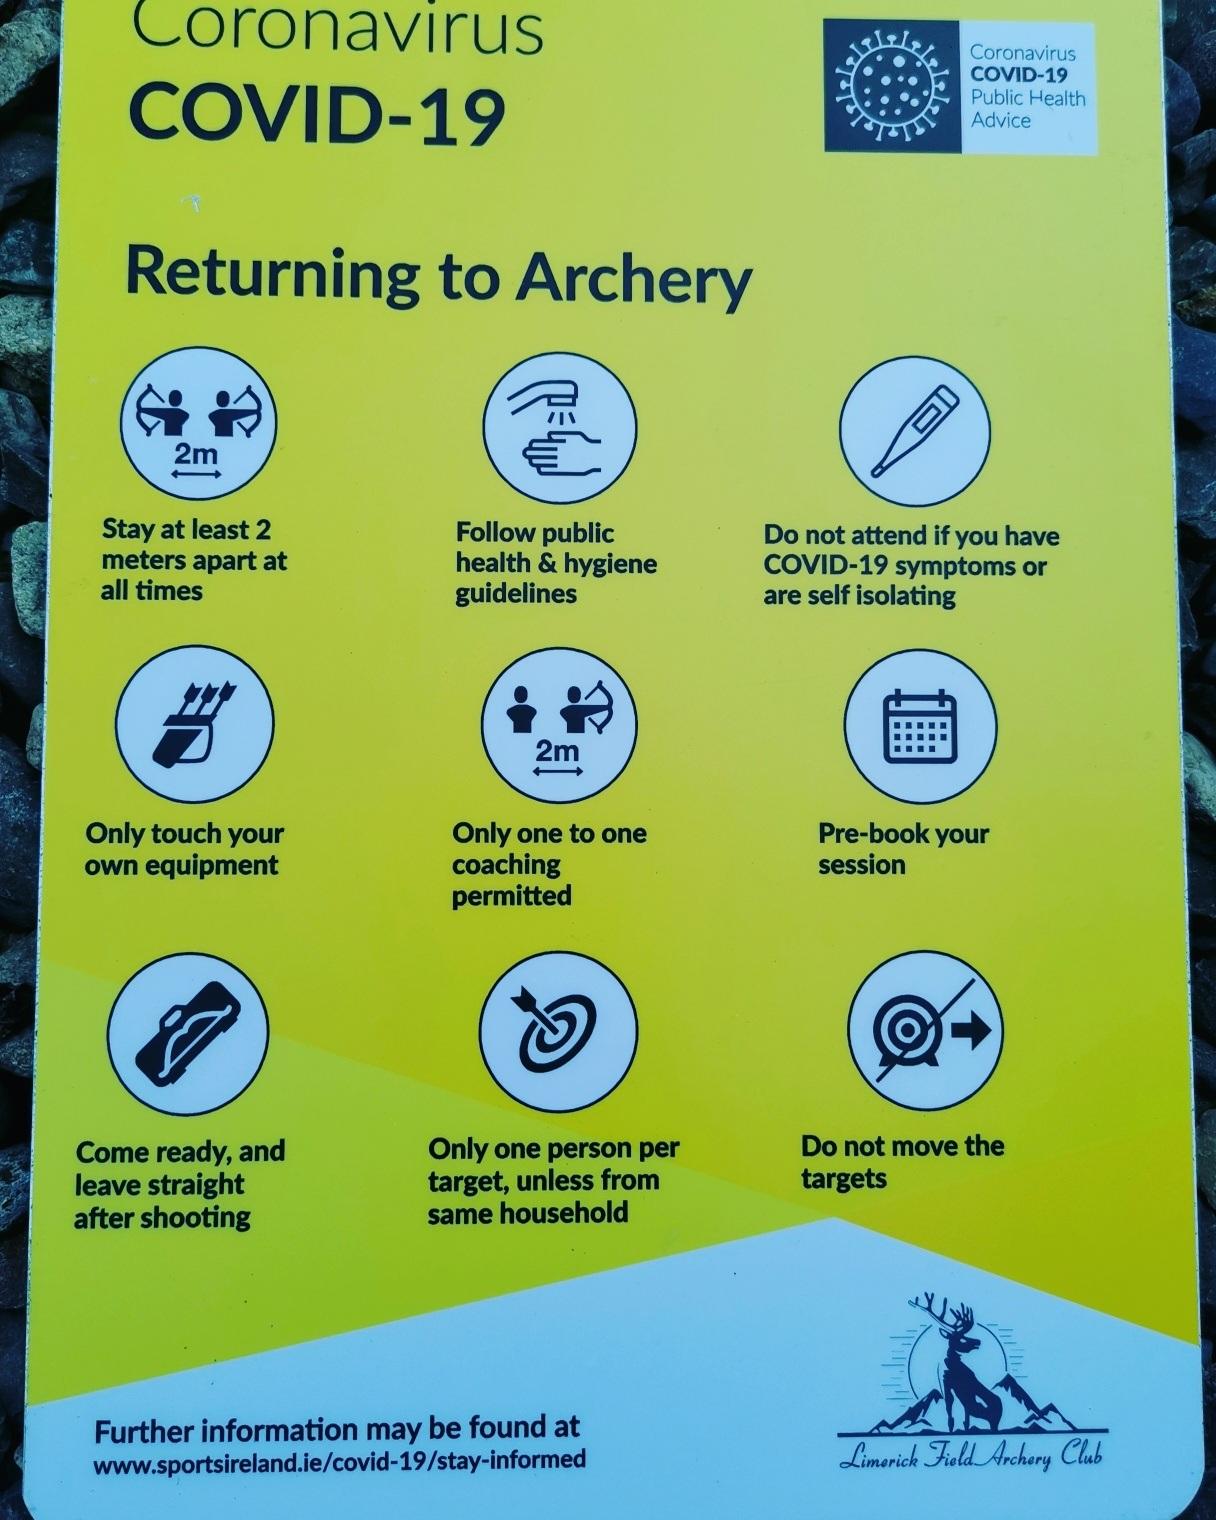 Returning to Archery